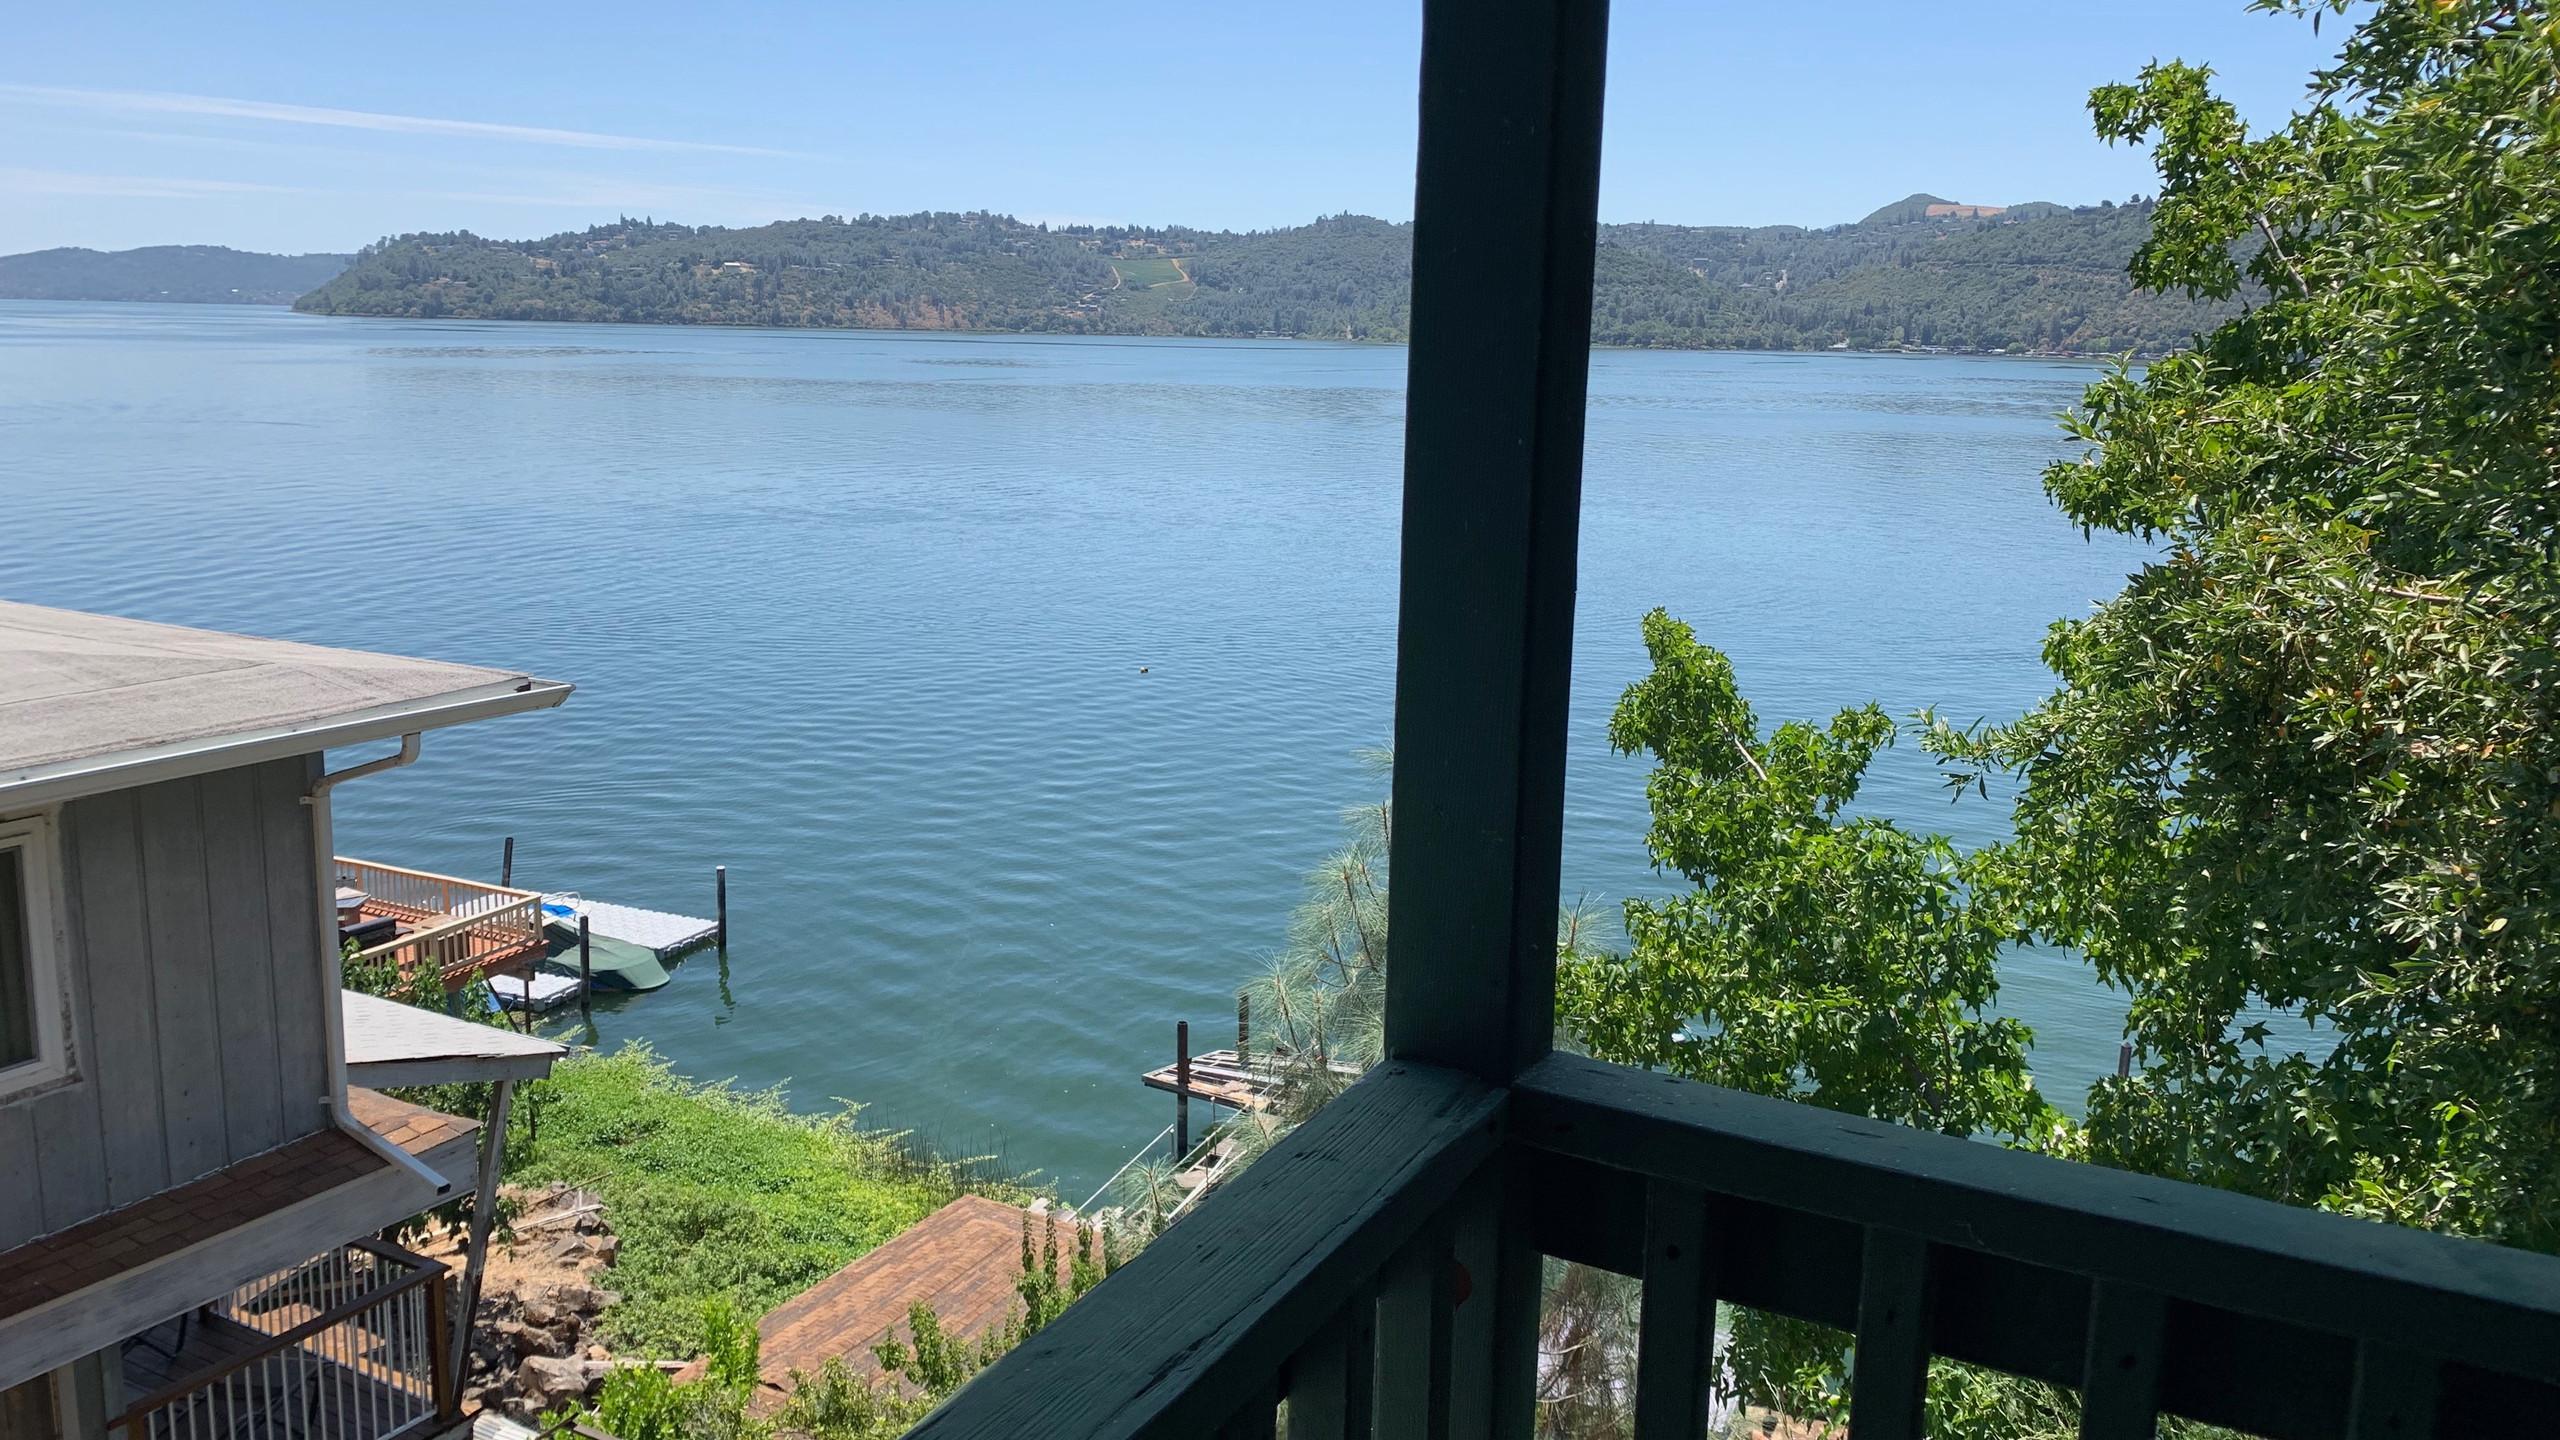 Lake house, again.